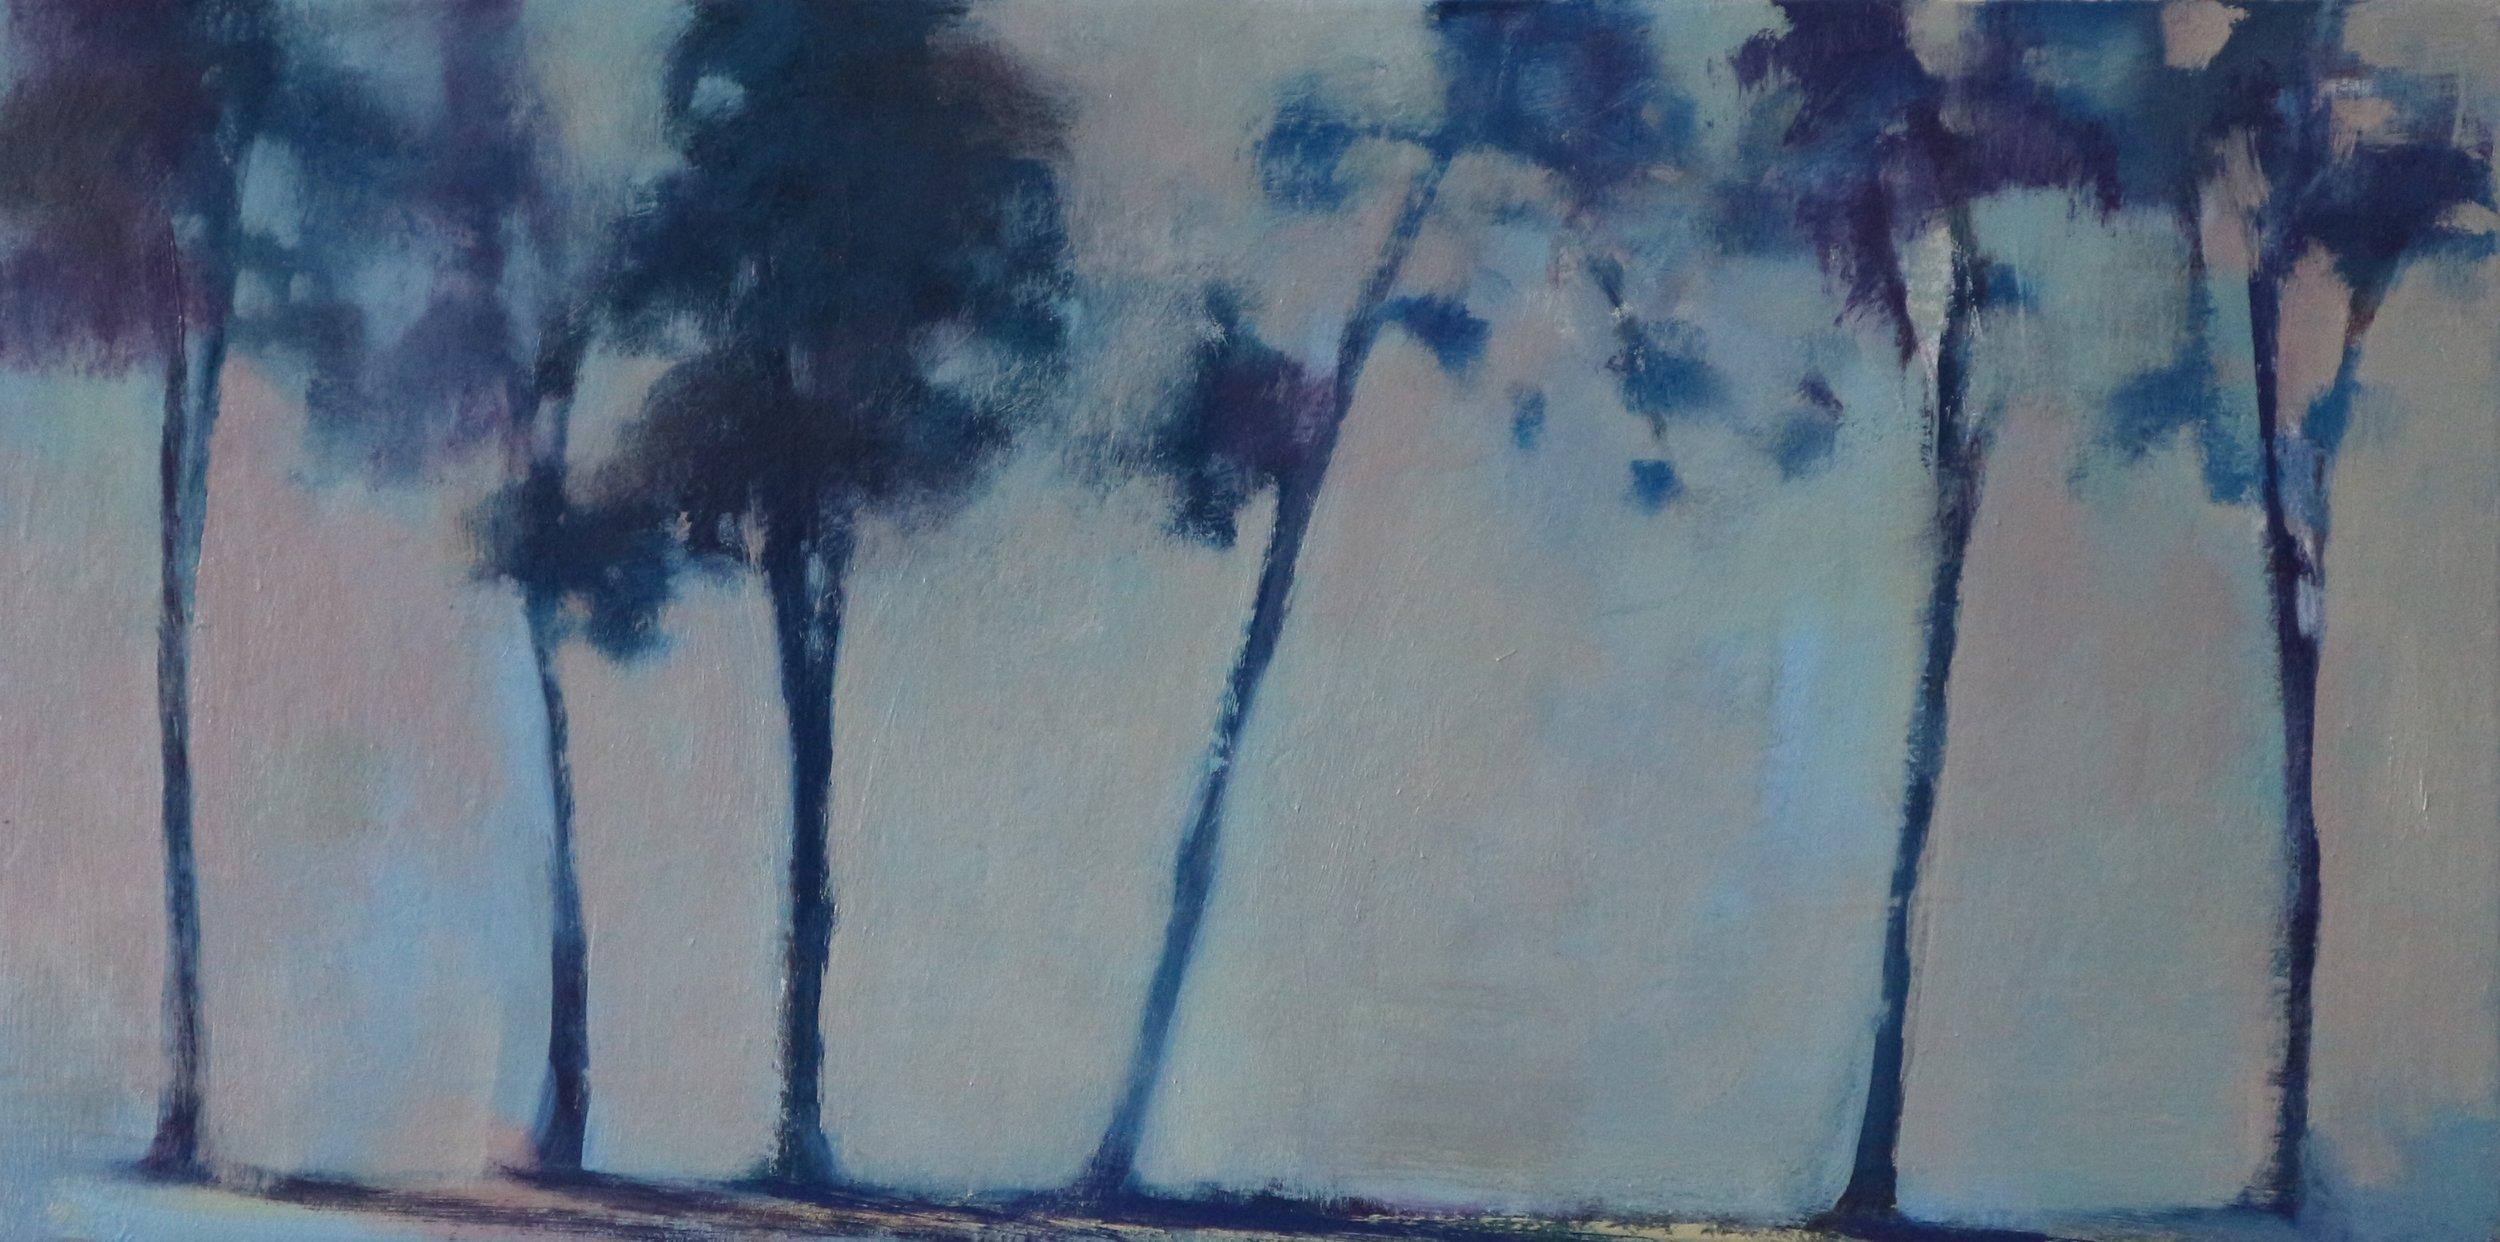 Title: Treeline Study  Size: 30 x 60 cm  Medium: Oil on canvas  Price: £995